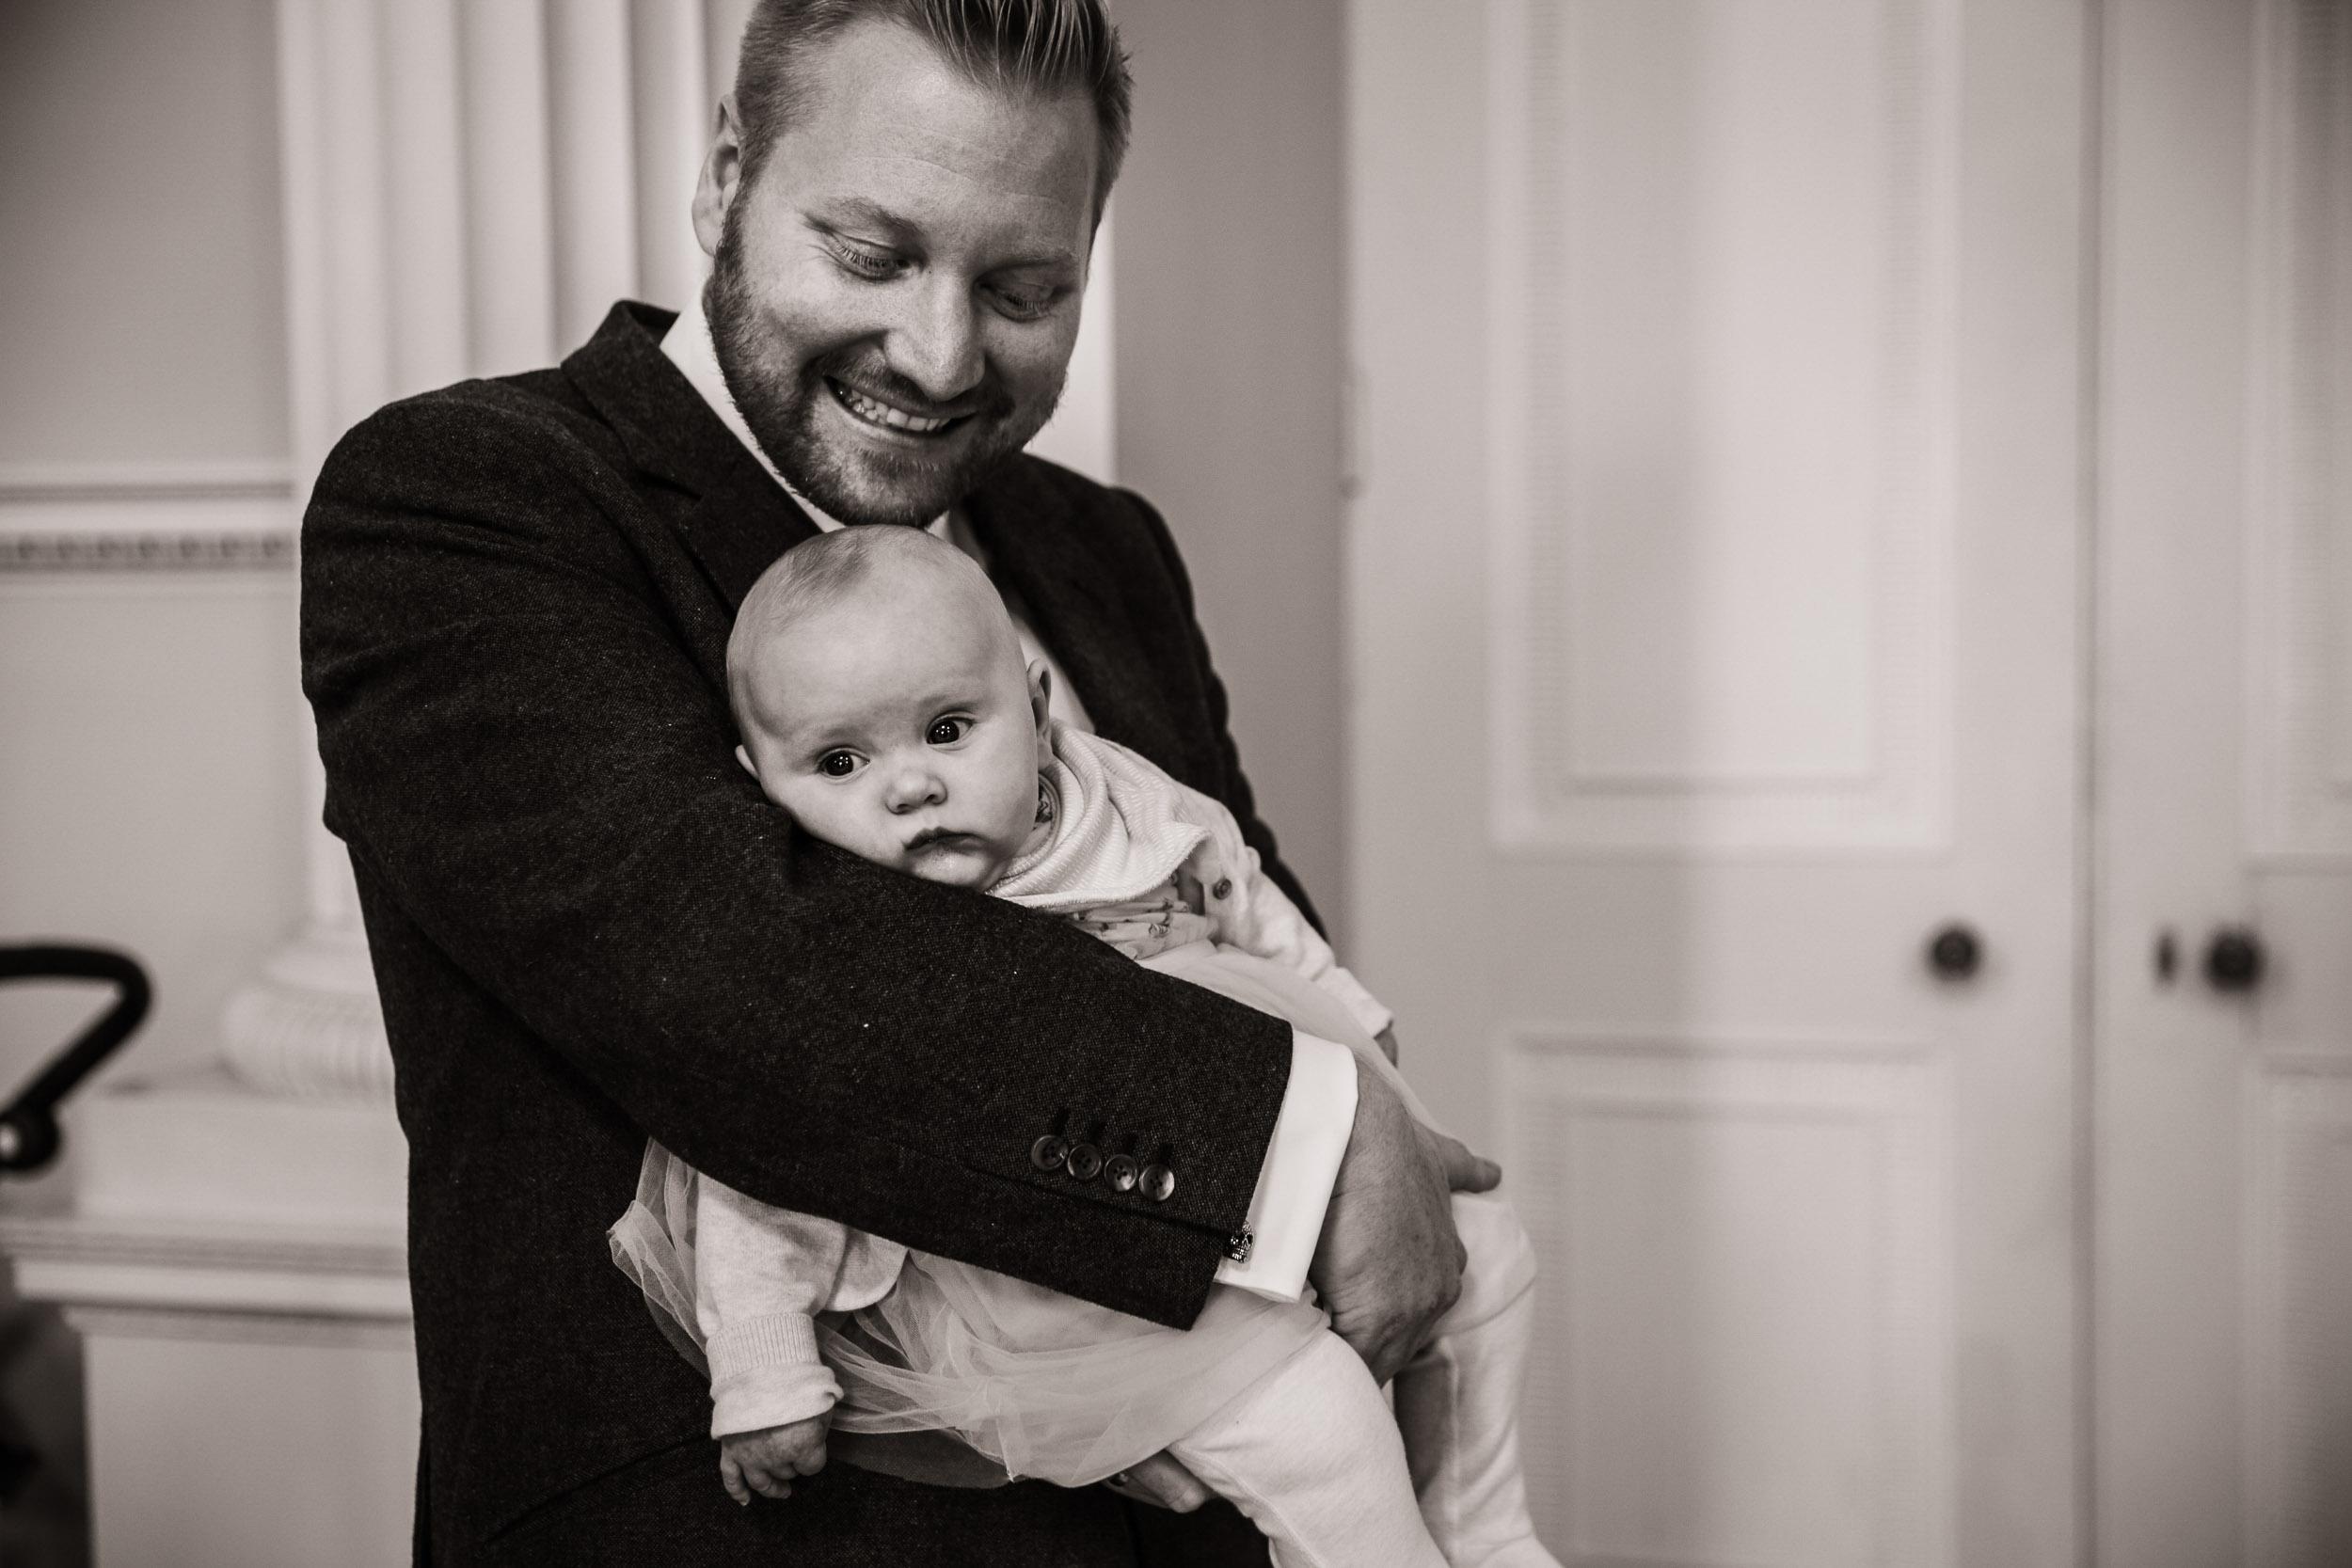 syon-house-wedding-photographer-london 030.jpg